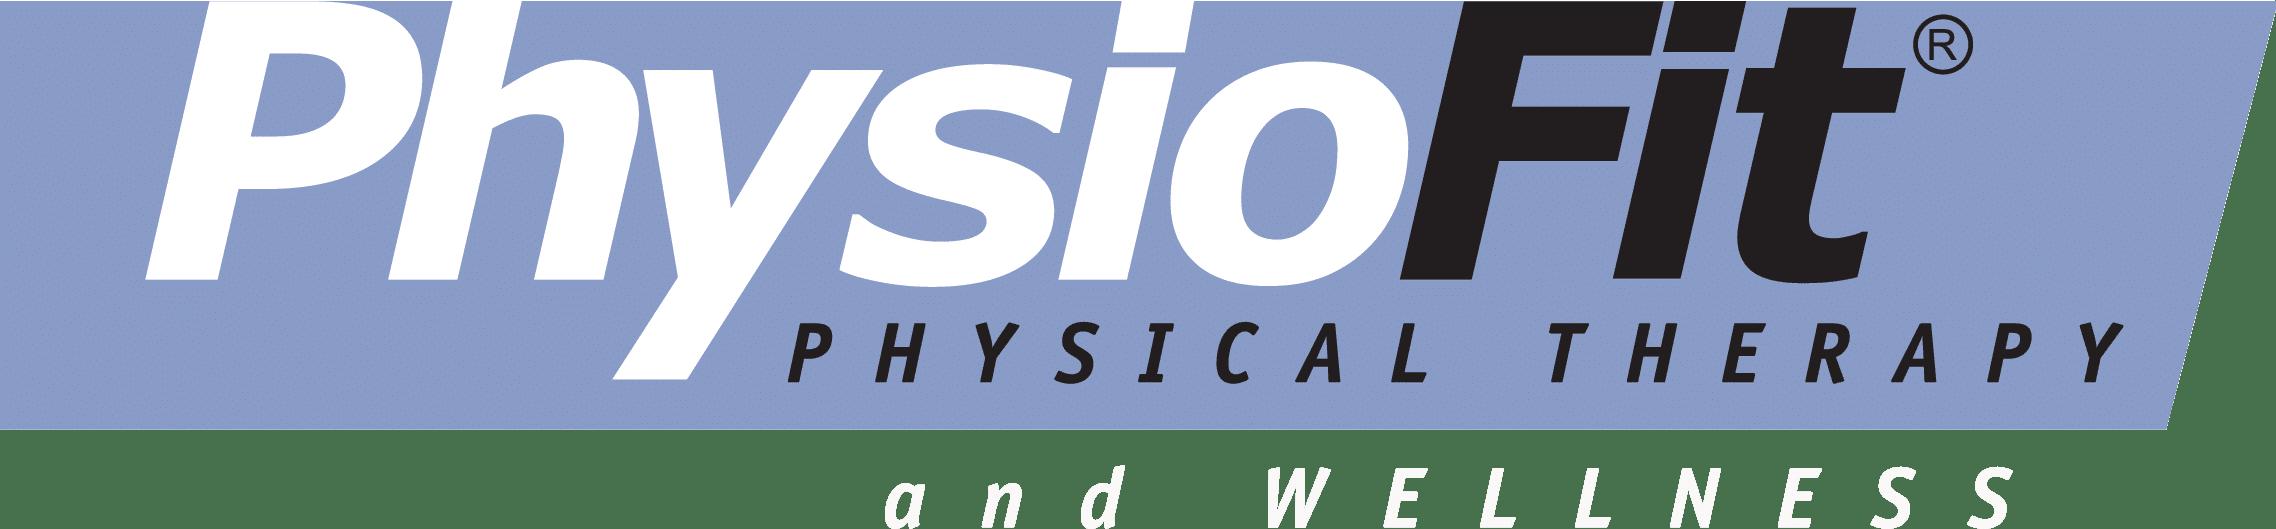 physiofit vector logo2 white